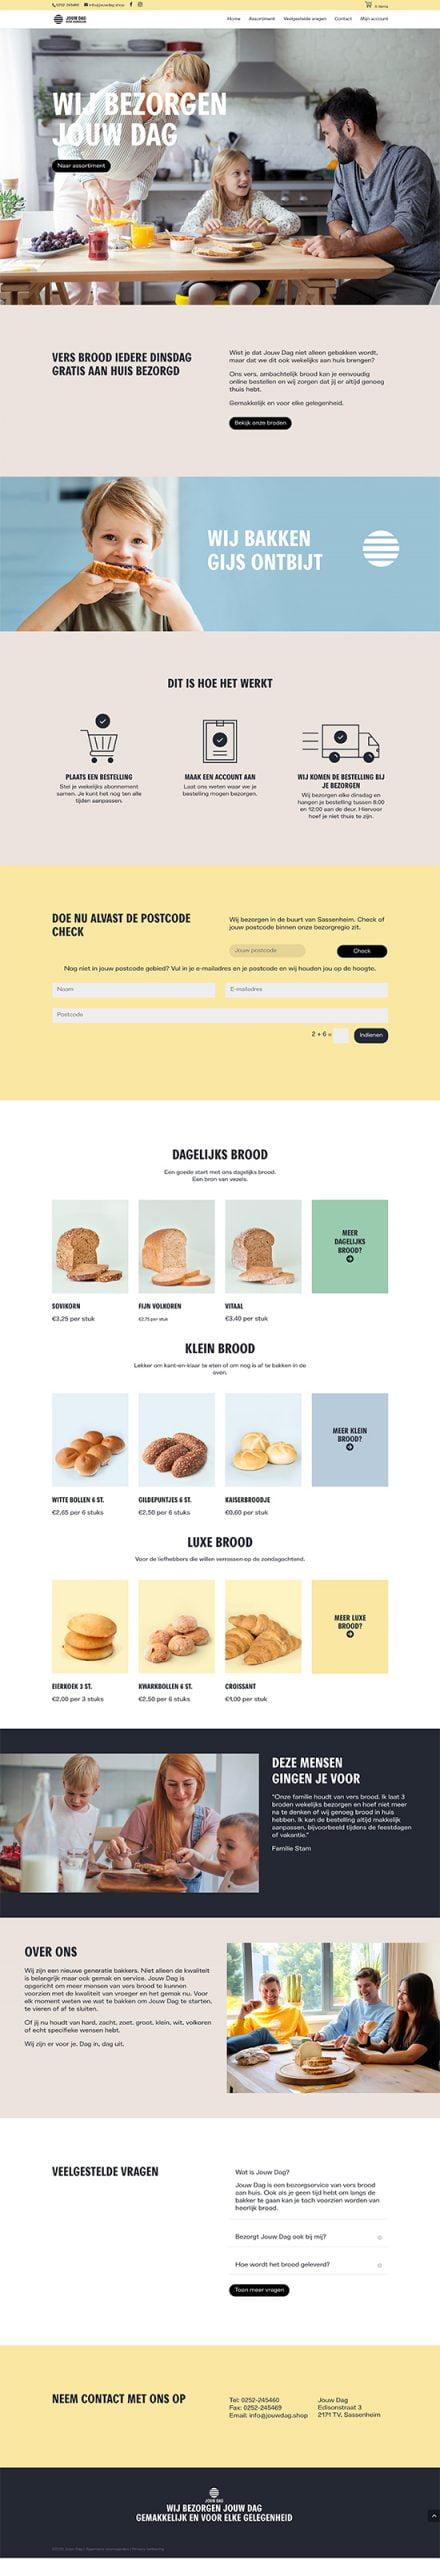 Jouw Dag Brood